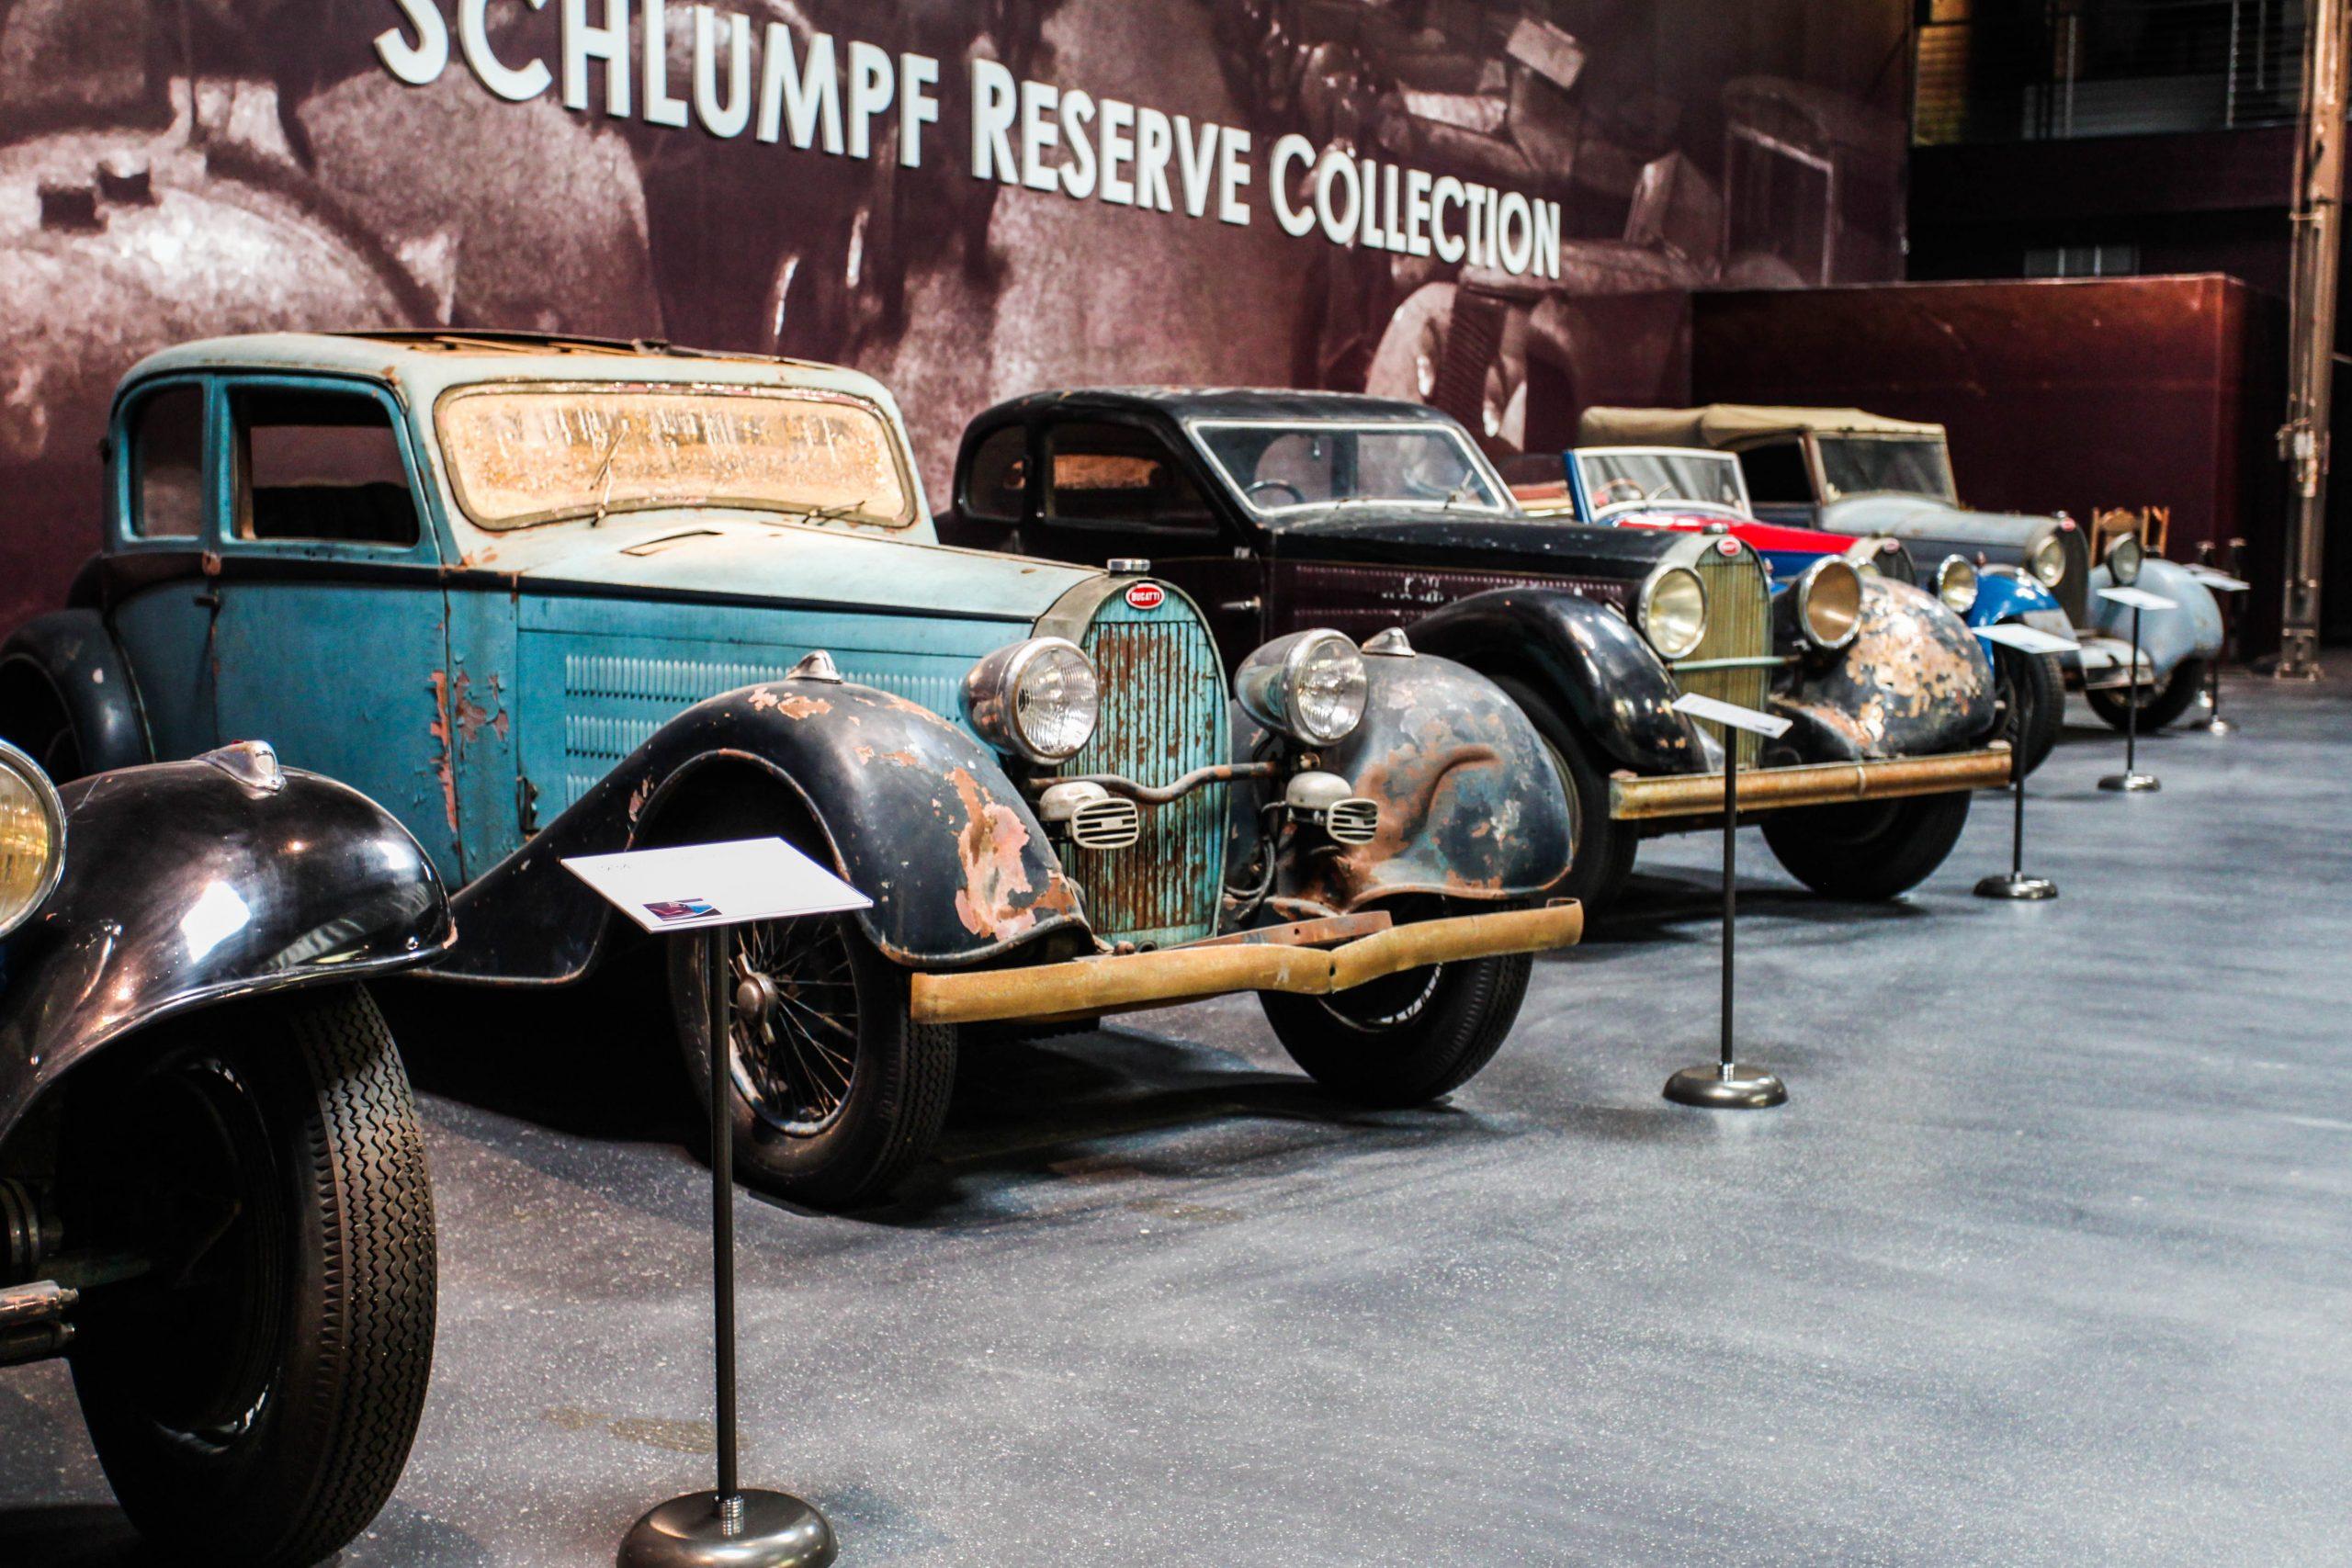 Bugatti Collection Fritz Schlumpfphoto